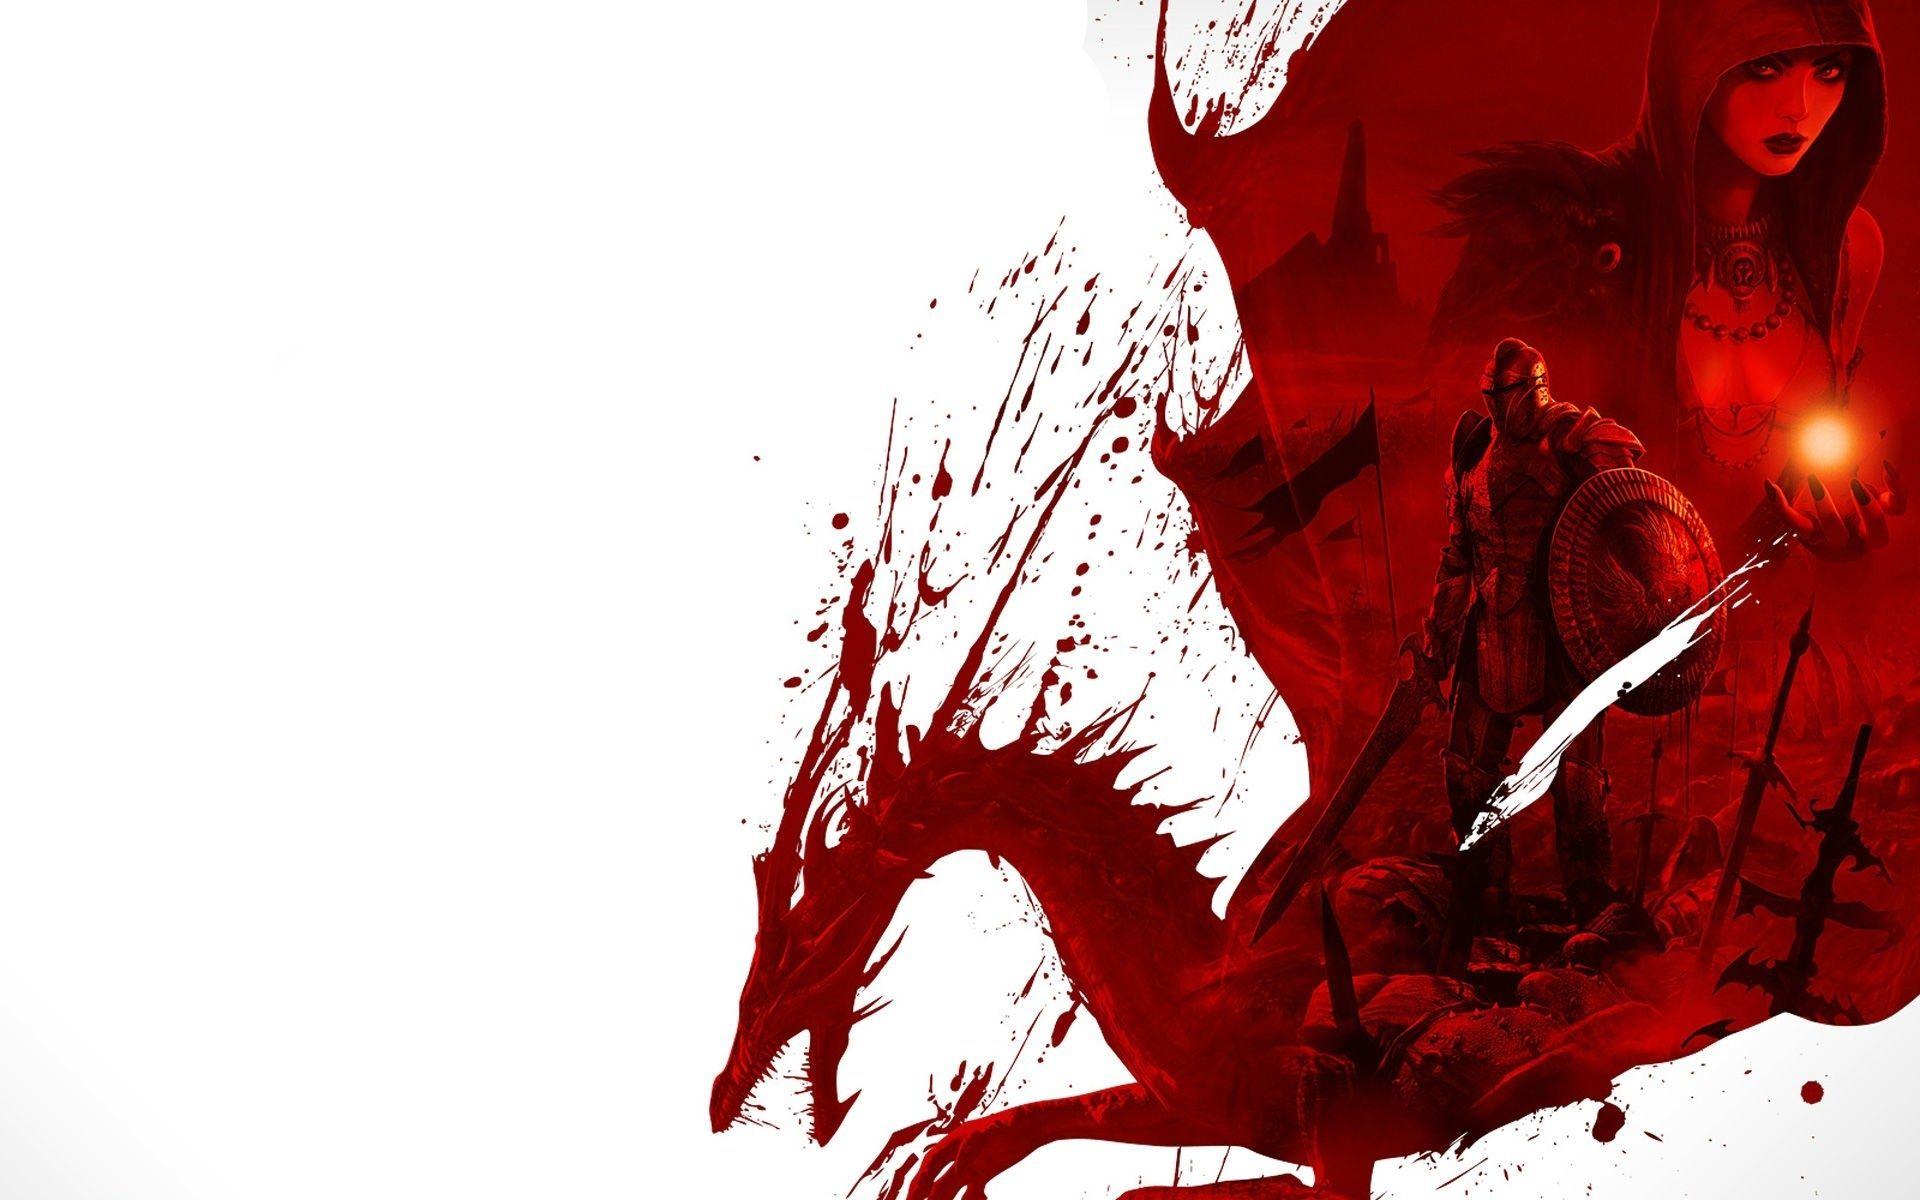 10 New Dragon Age Origins Wallpaper 1920x1080 Full Hd 1920 1080 For Pc Background Dragon Age Origins Dragon Age Series Dragon Age